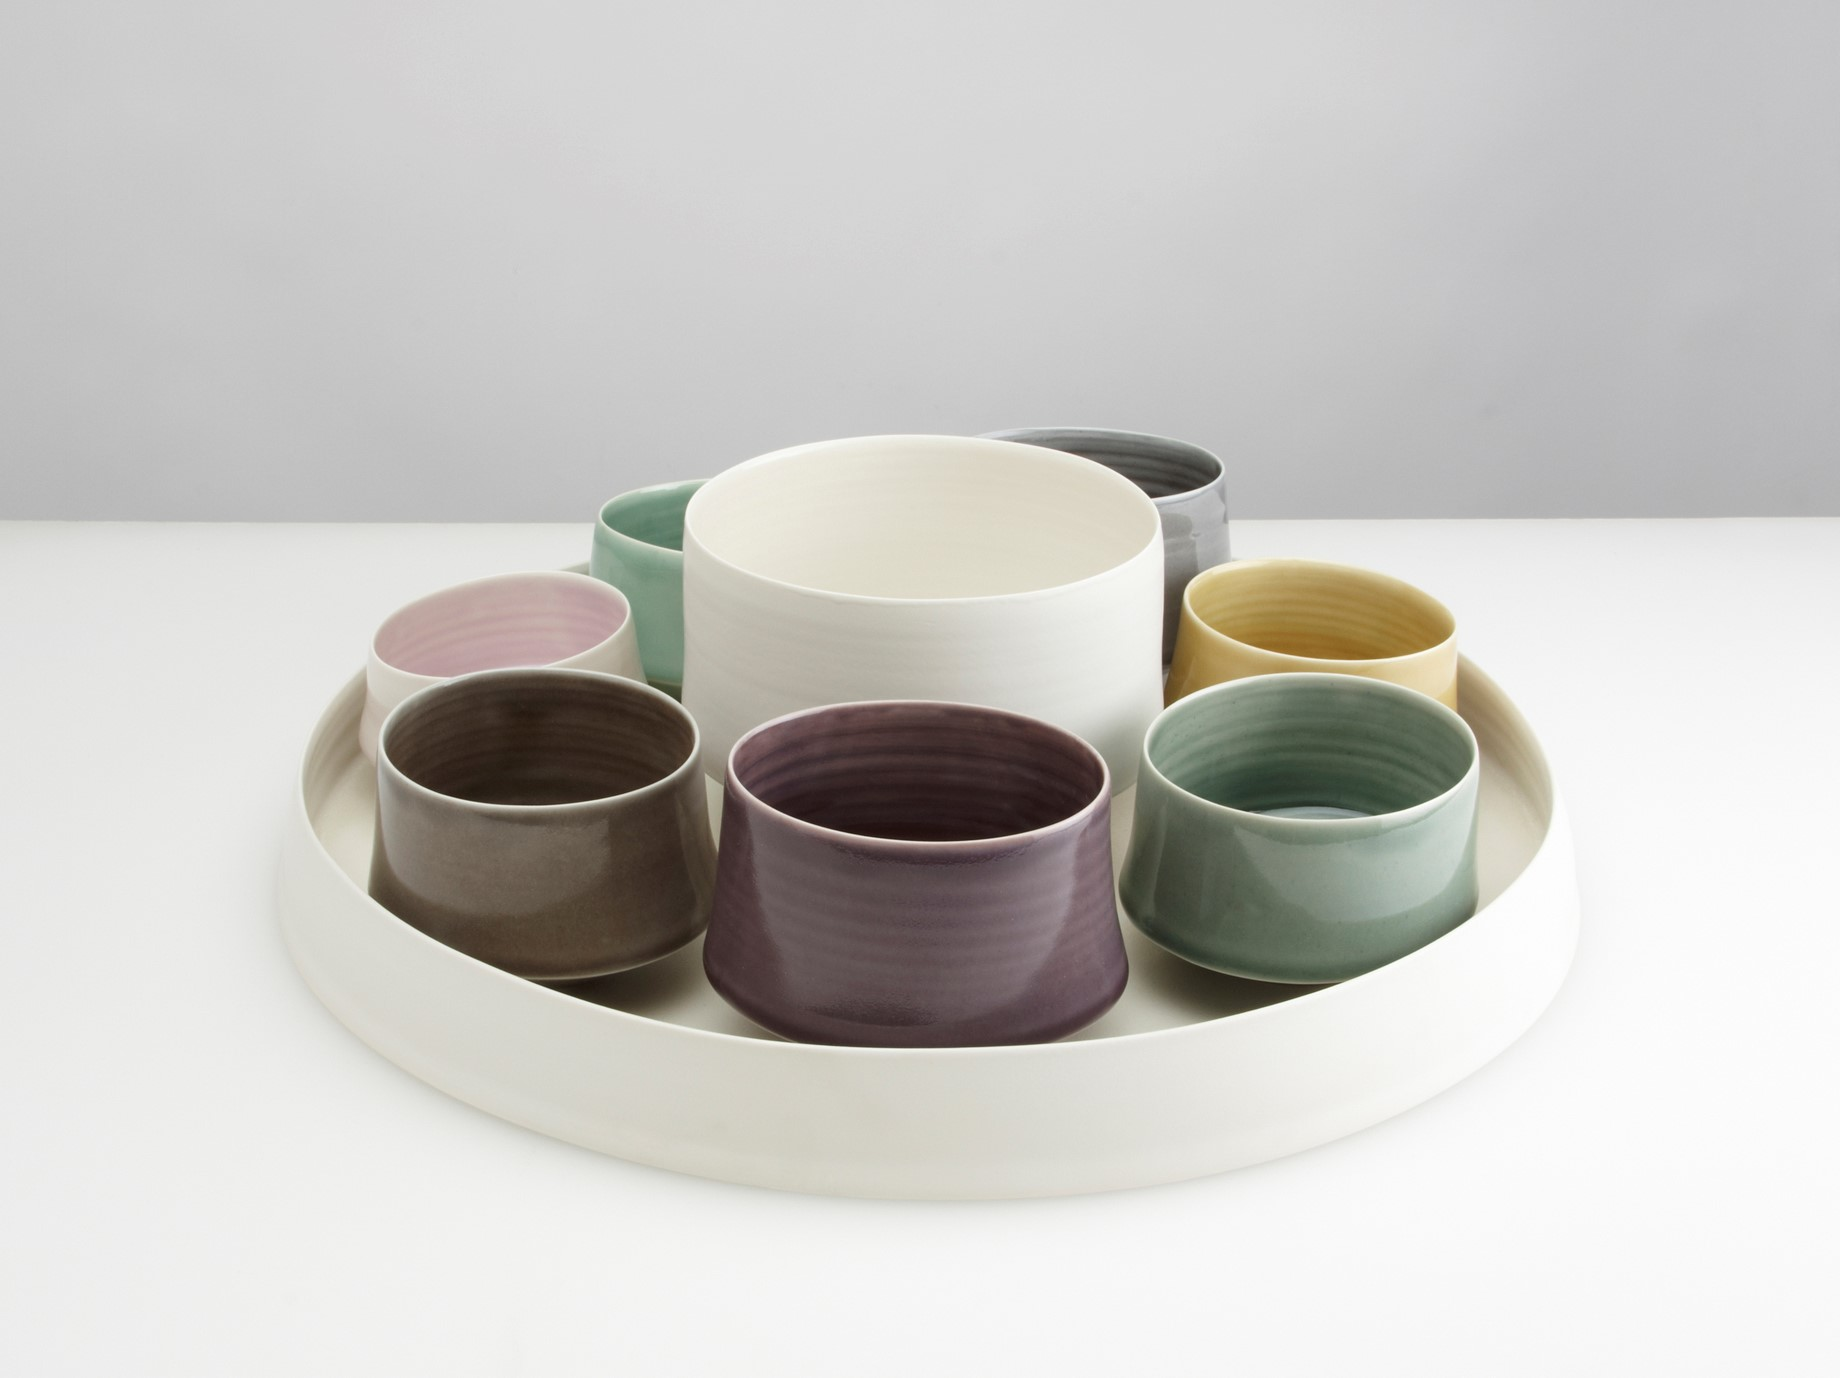 Oriole Supper Set  ceramic  Dish - 4 x 27 cm  large white vessel - 9 x 10 cm  small coloured vessels - 5.5 x 5 cm approx.  £403